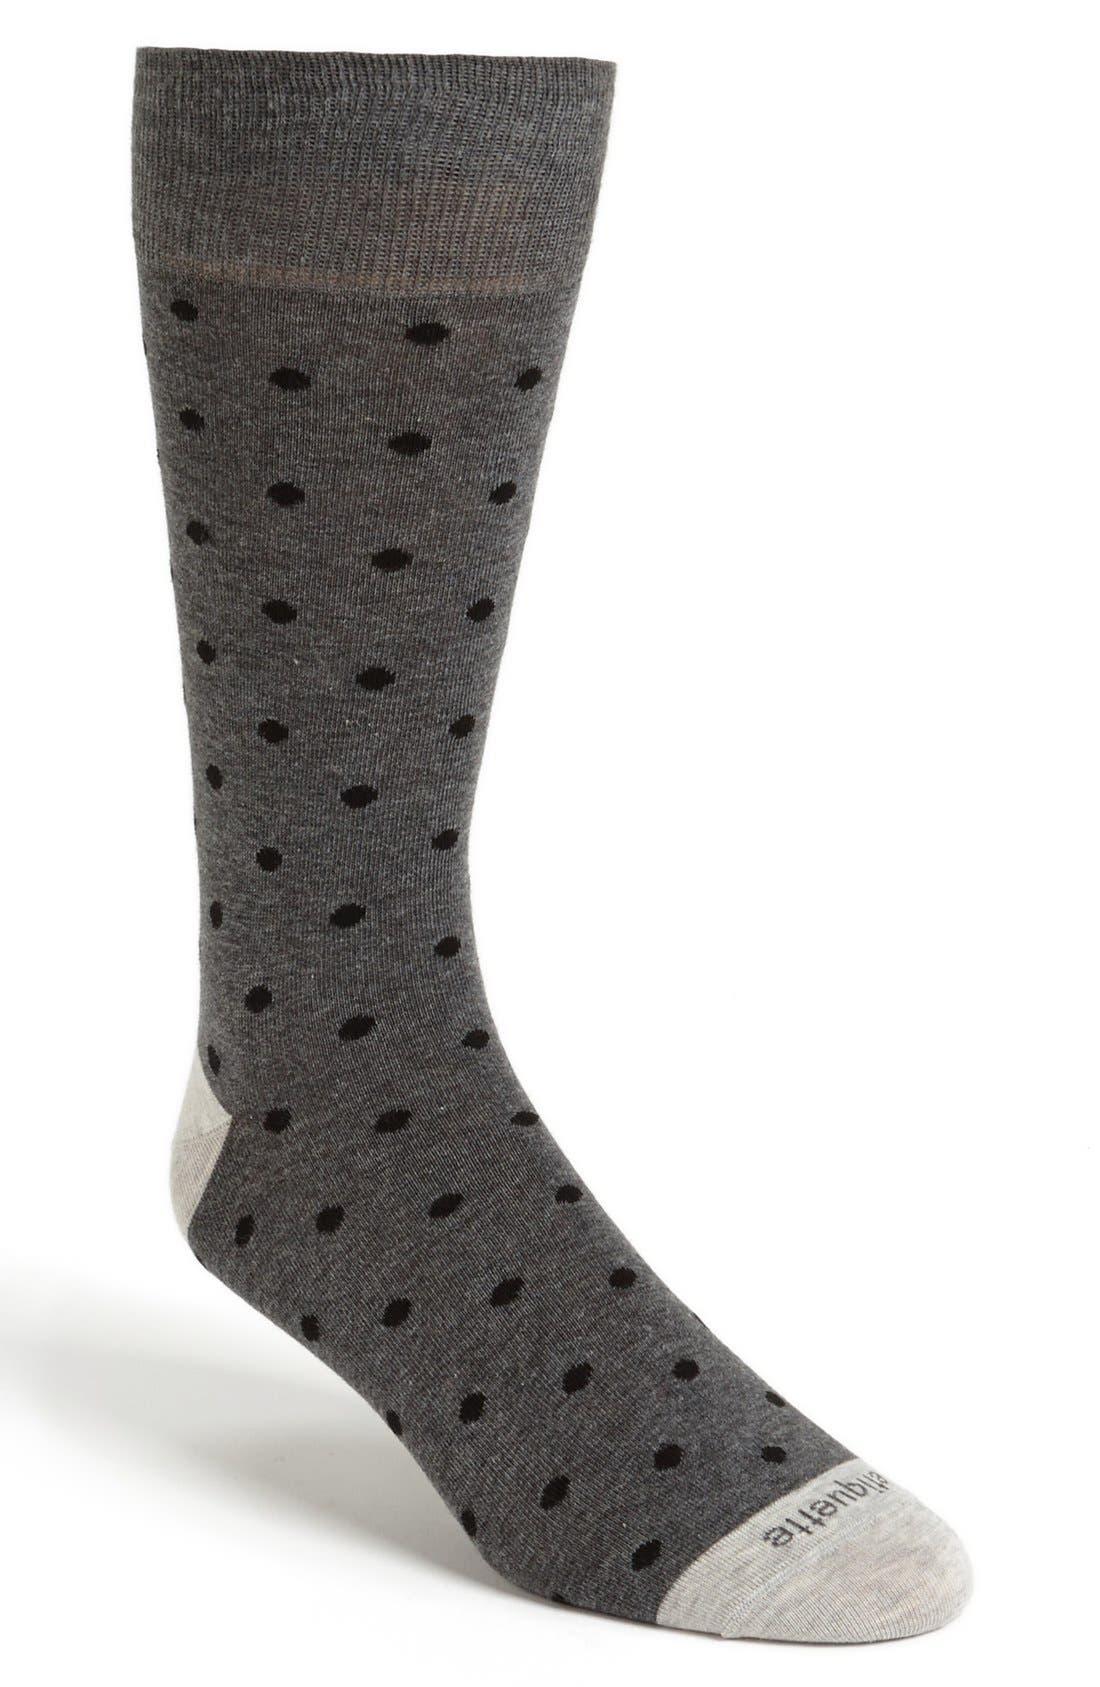 Alternate Image 1 Selected - Etiquette Clothiers Dot Socks